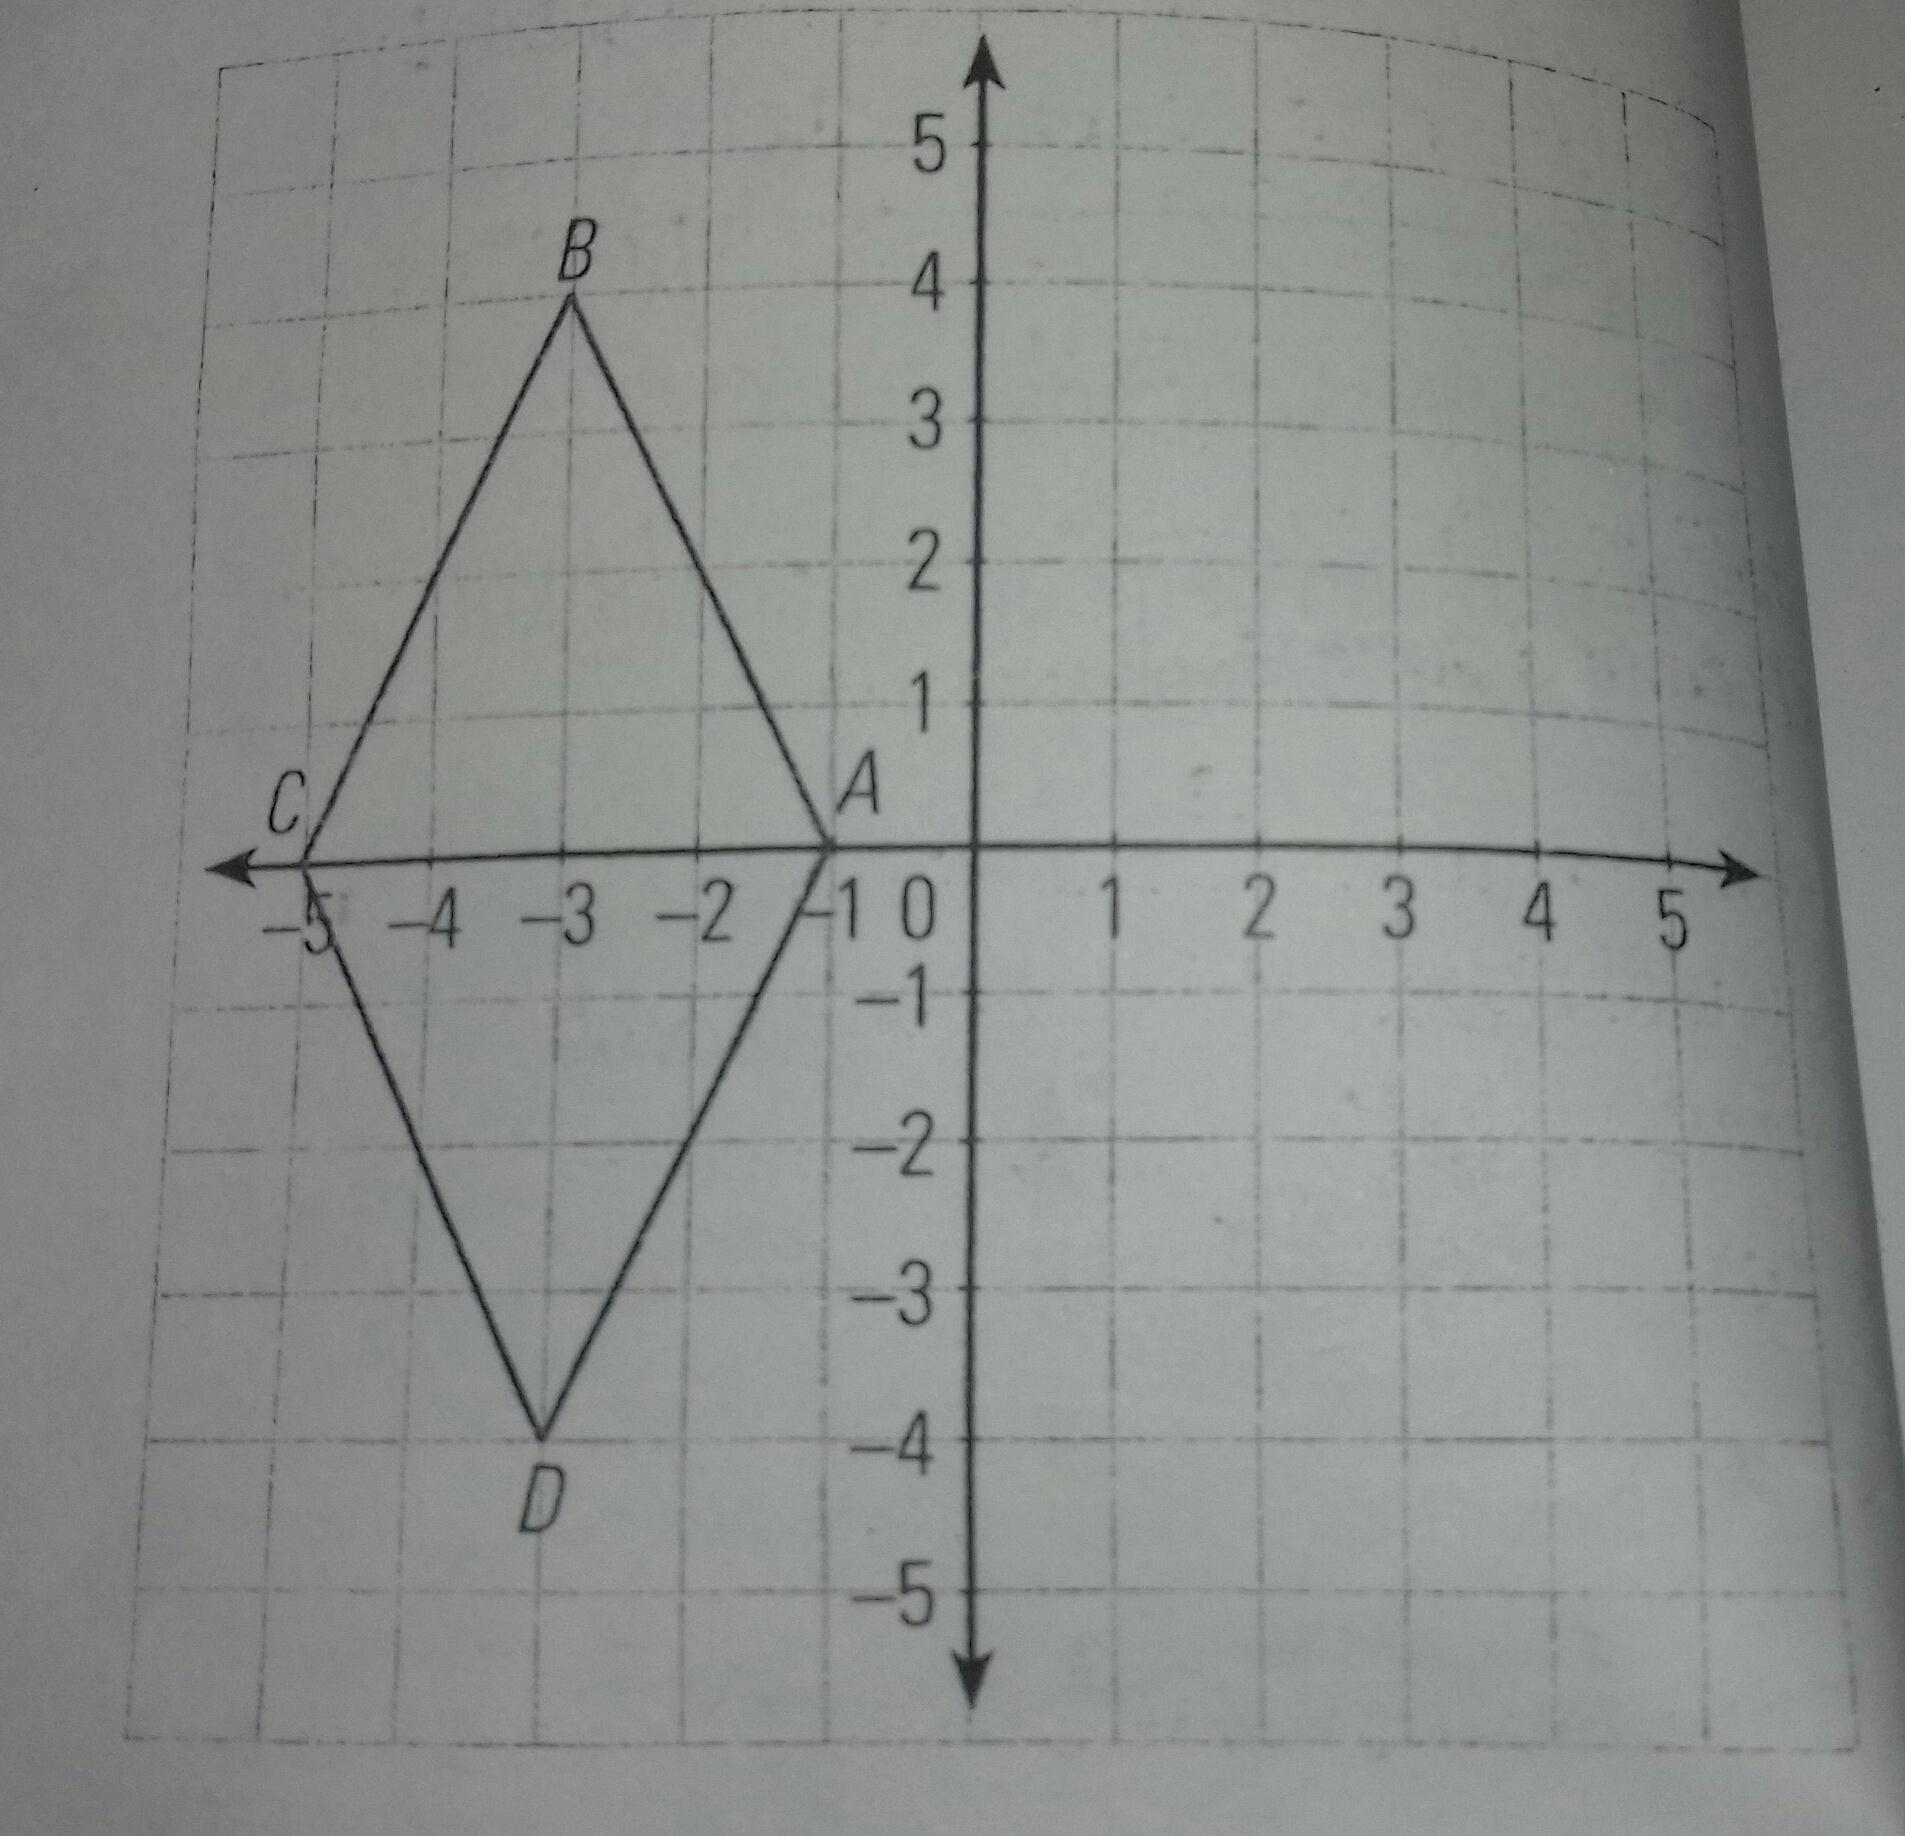 koordinat titik dari bayangan bangun ABCD yang dicerminkan ...